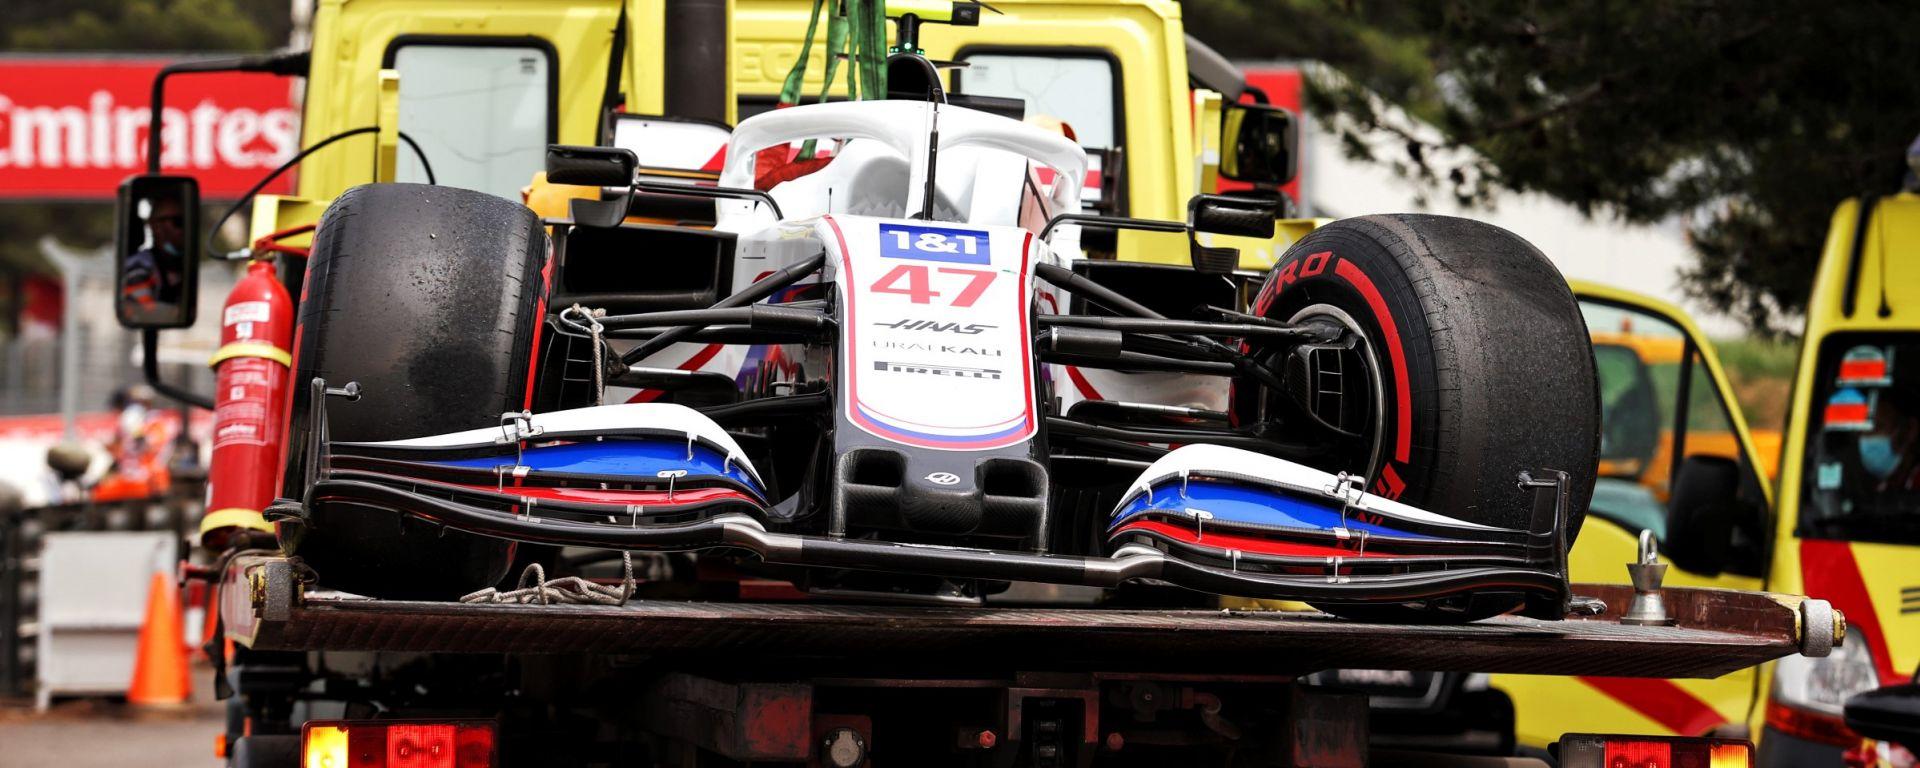 F1, GP Francia 2021: la Haas incidentata di Mick Schumacher